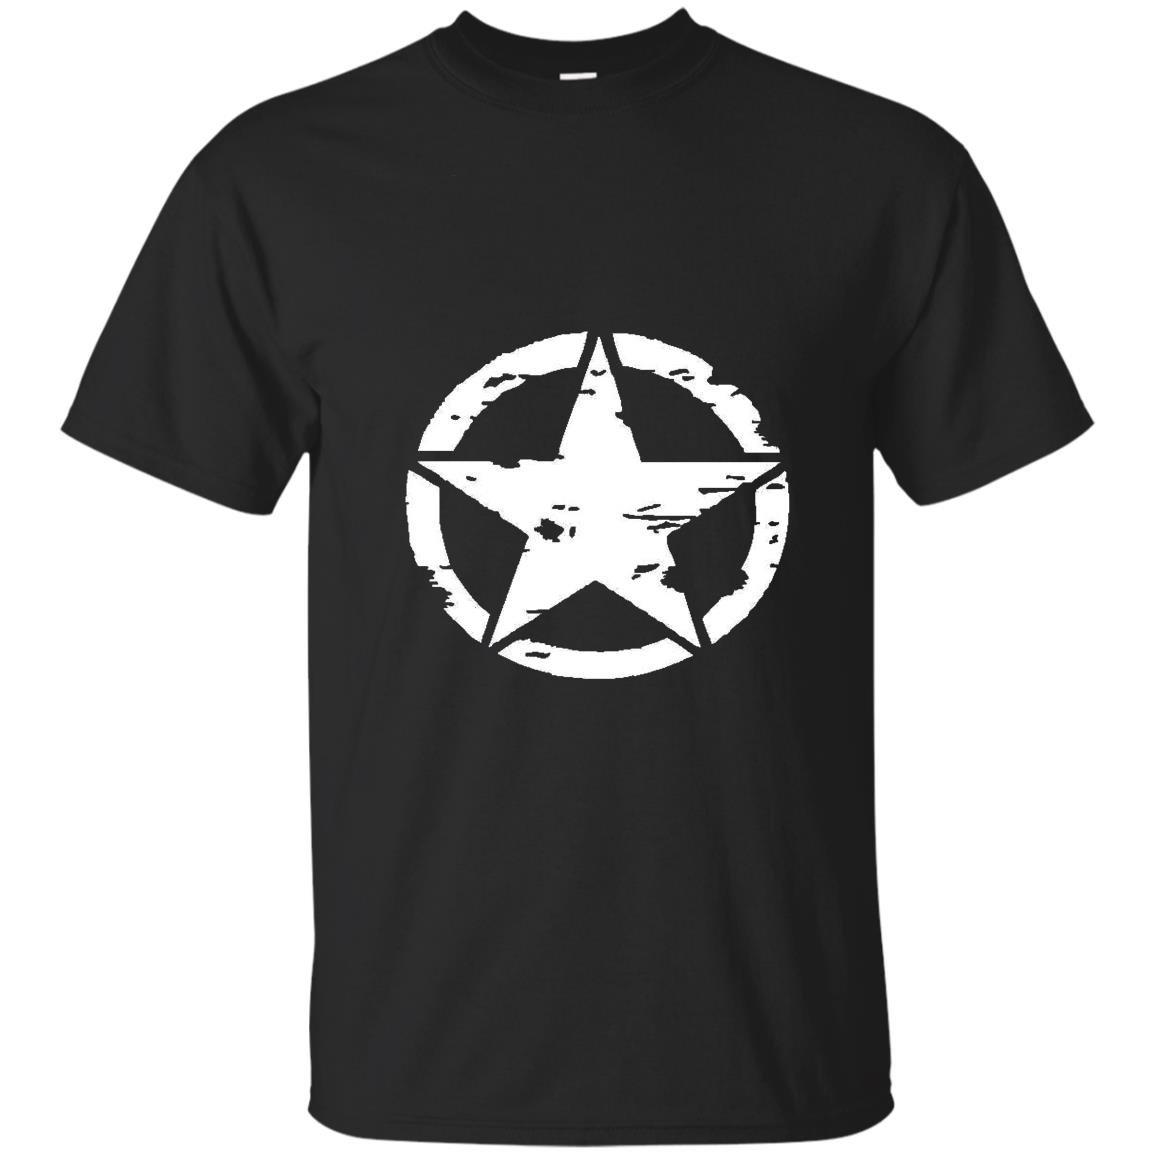 Oscar mike jeep military star T-shirt